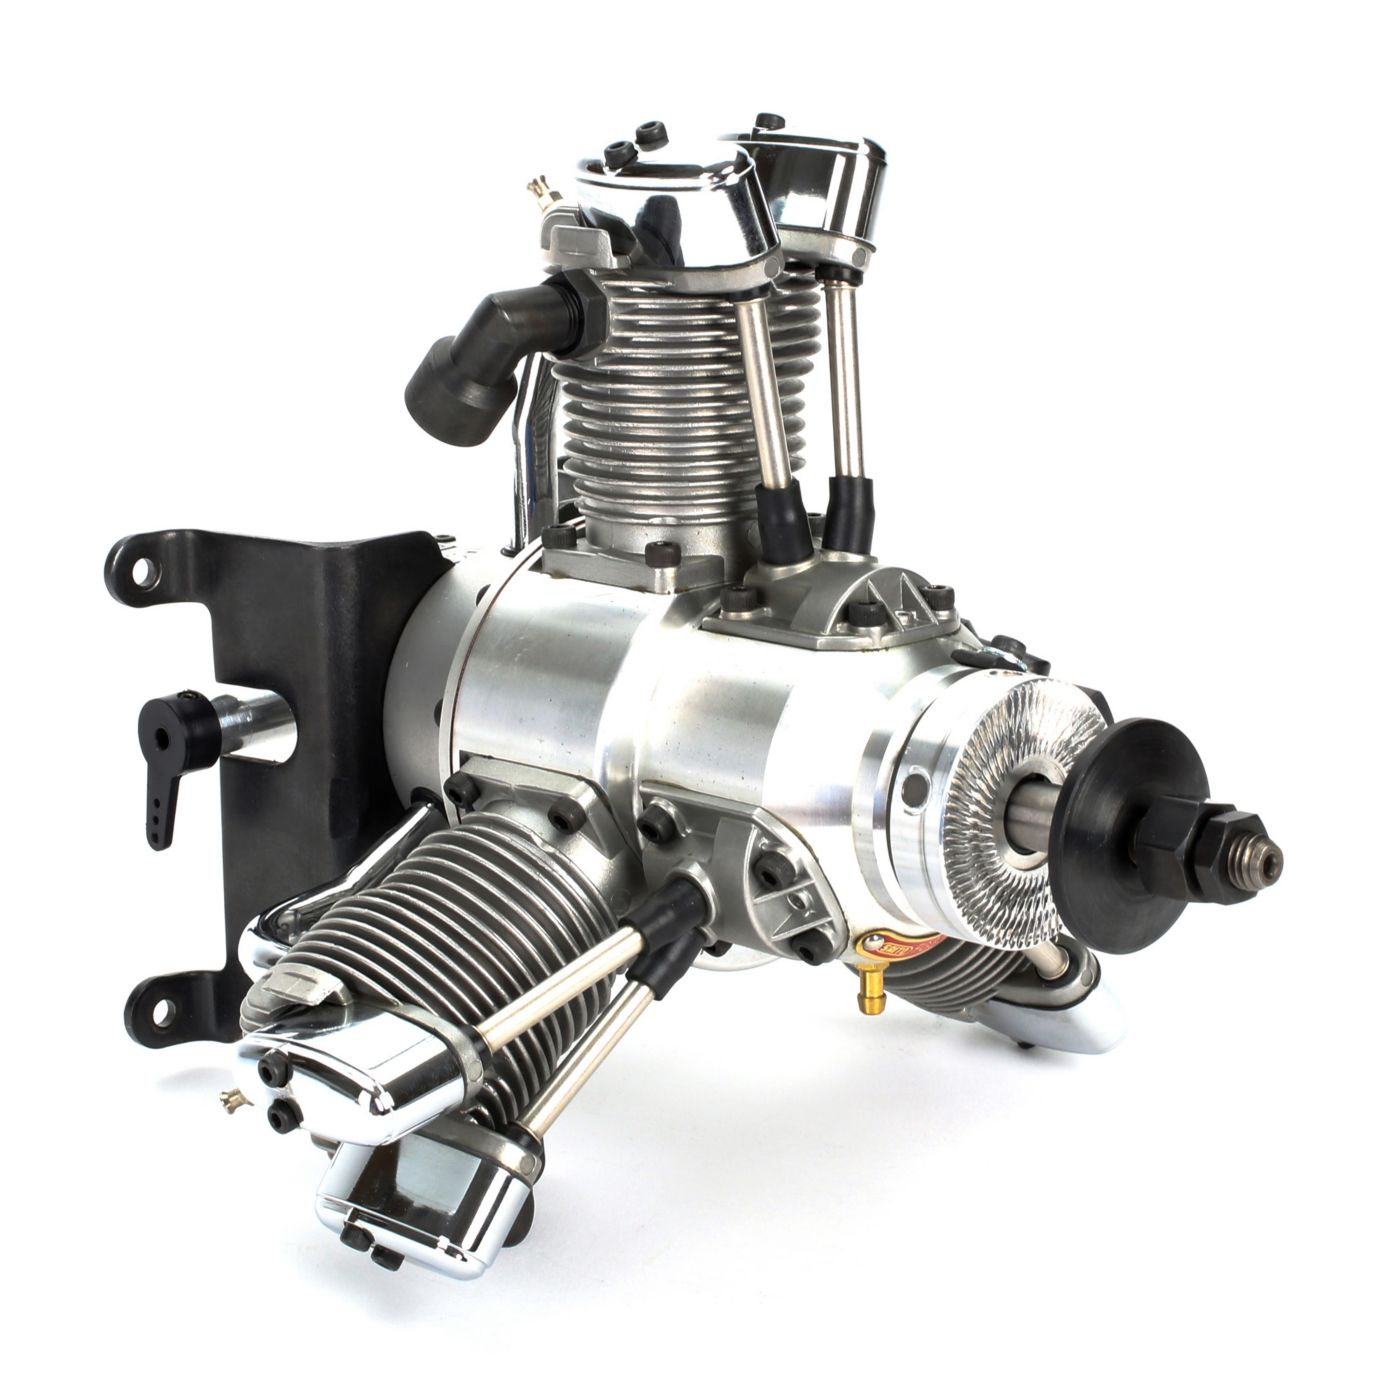 33cc 3-Cylinder Gas Radial Engine: BS | HorizonHobby